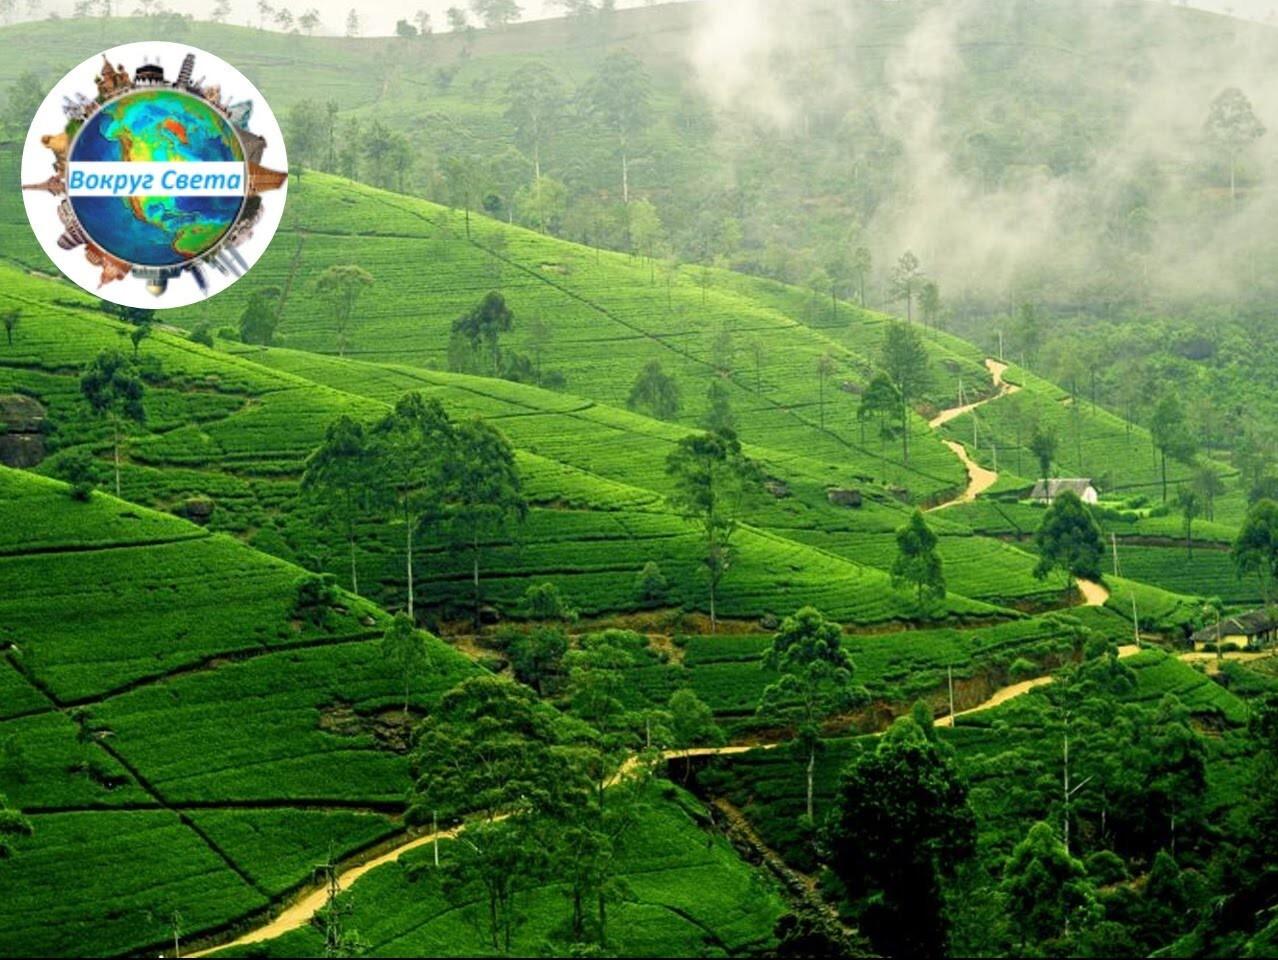 Шри-Ланка: покупки, достопримечательности, еда. Вокруг Света